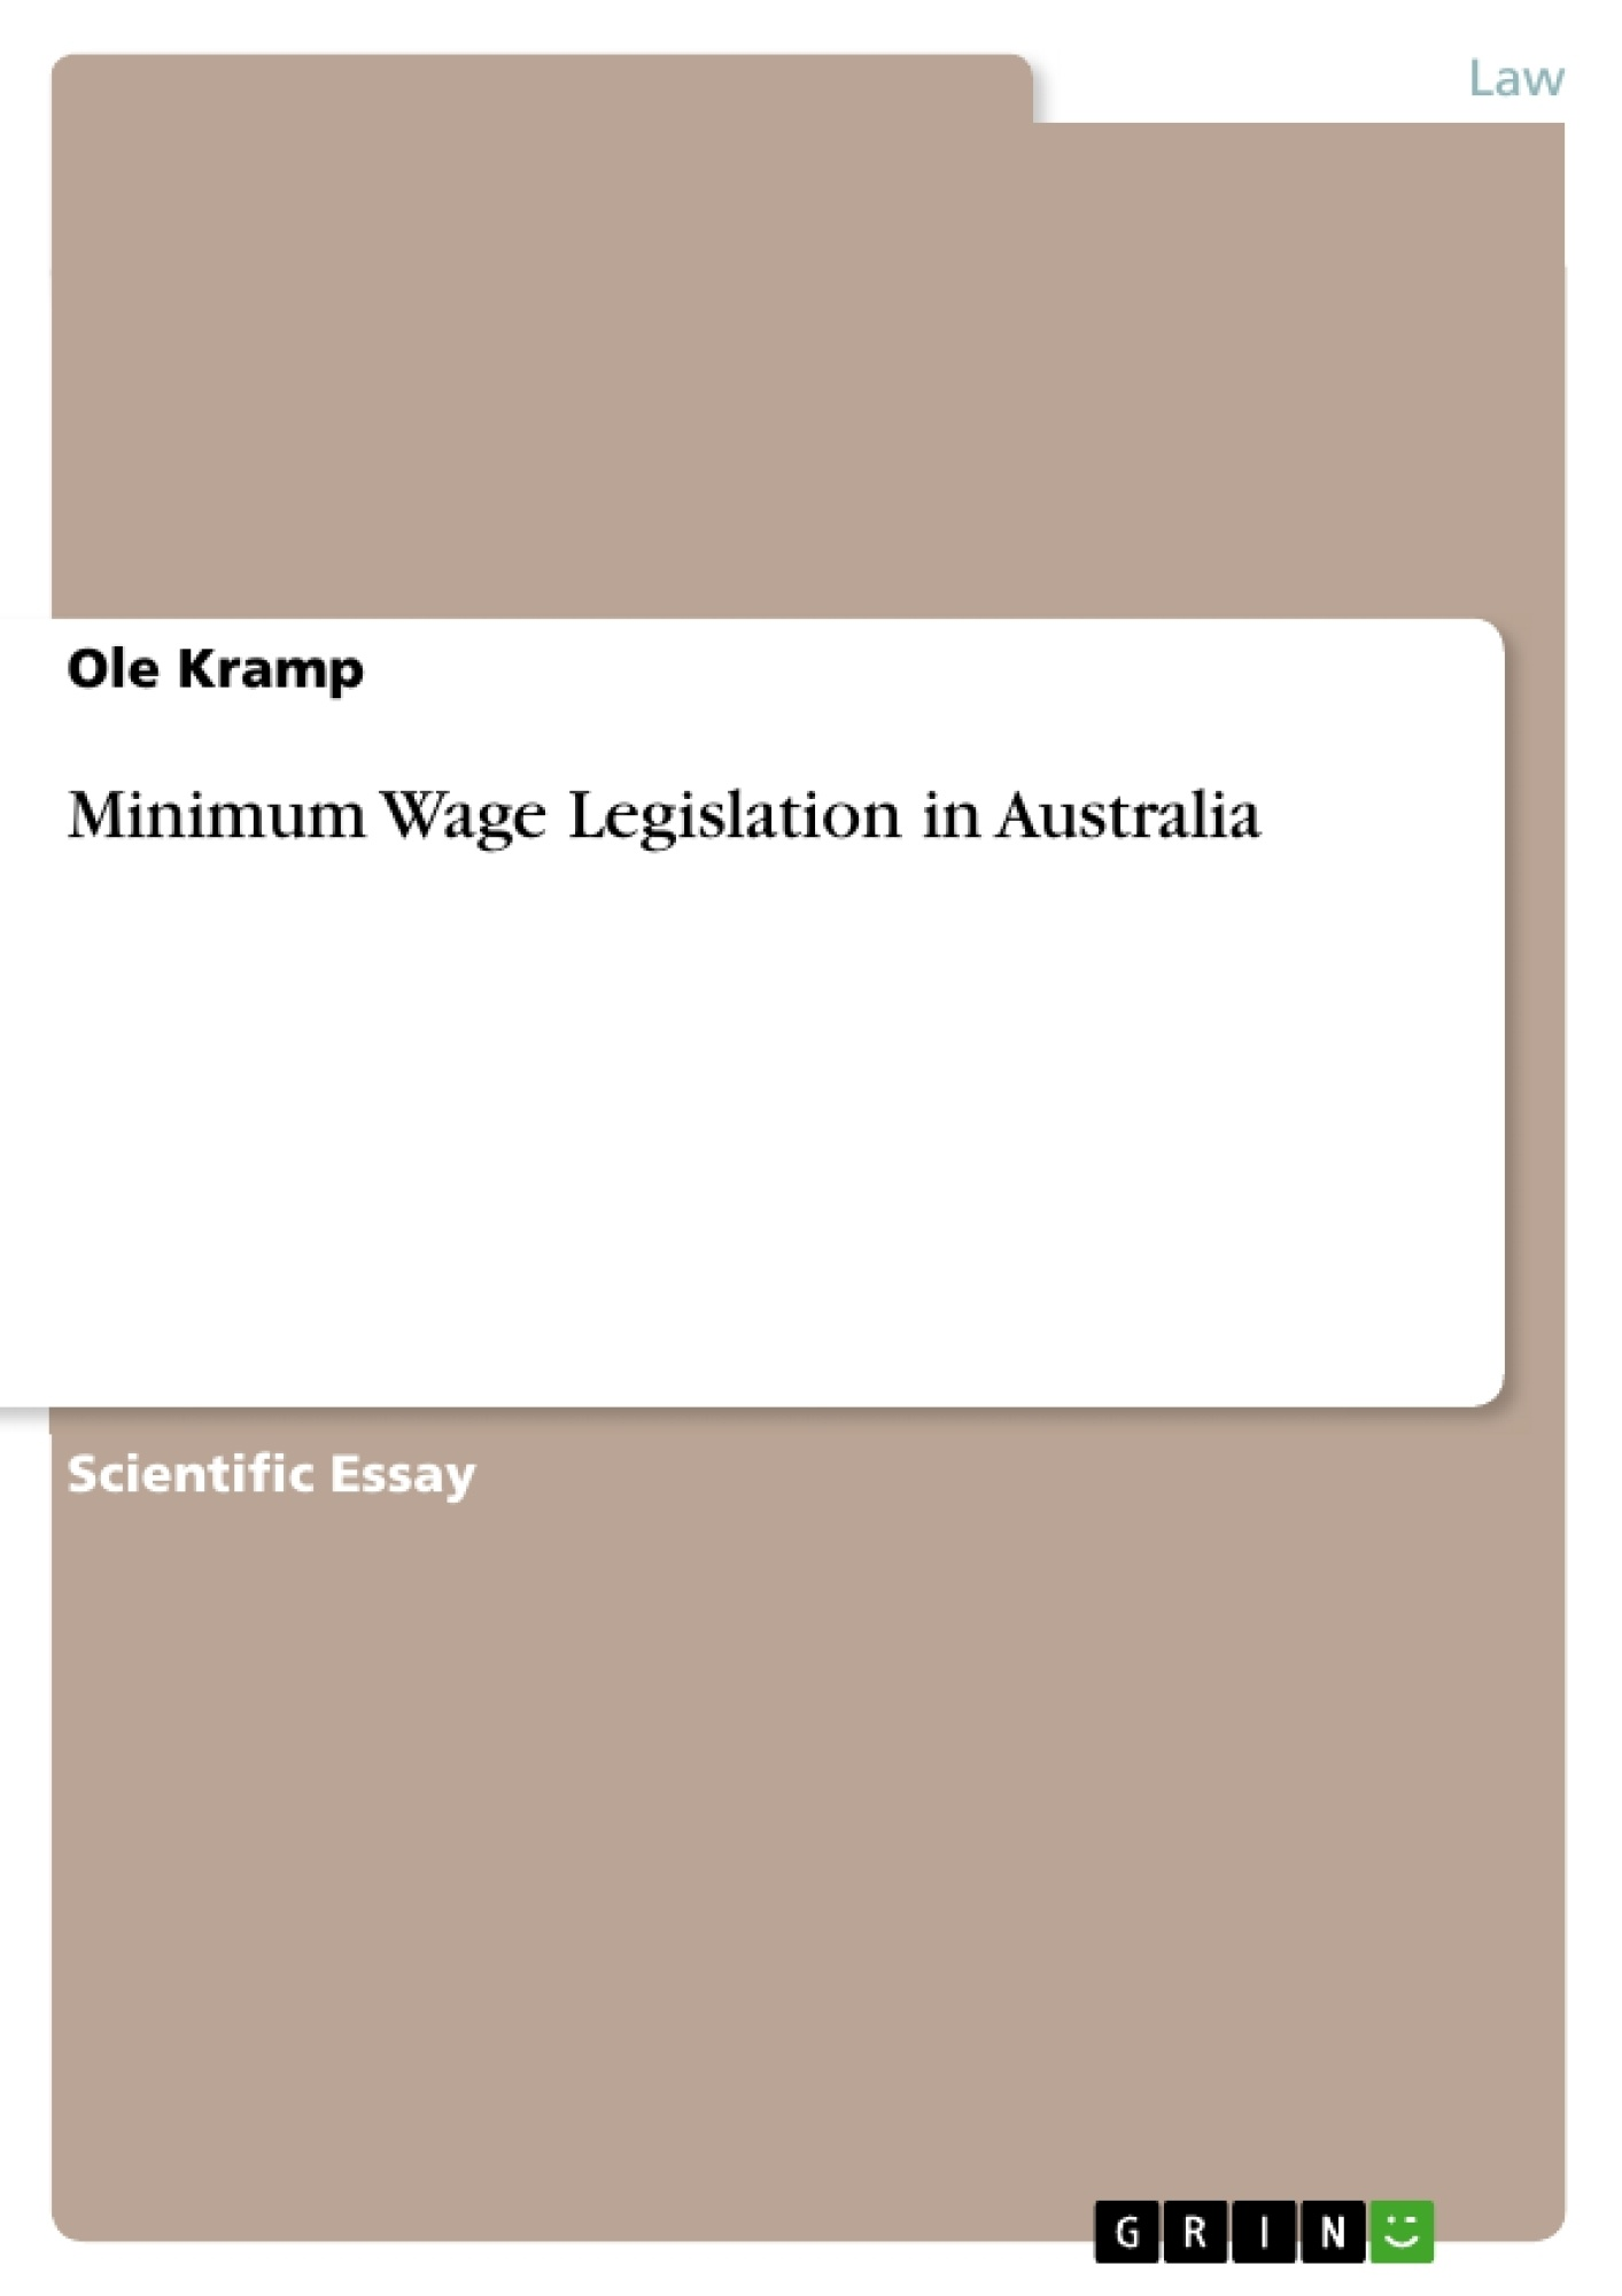 Minimum Wage Legislation Assignment